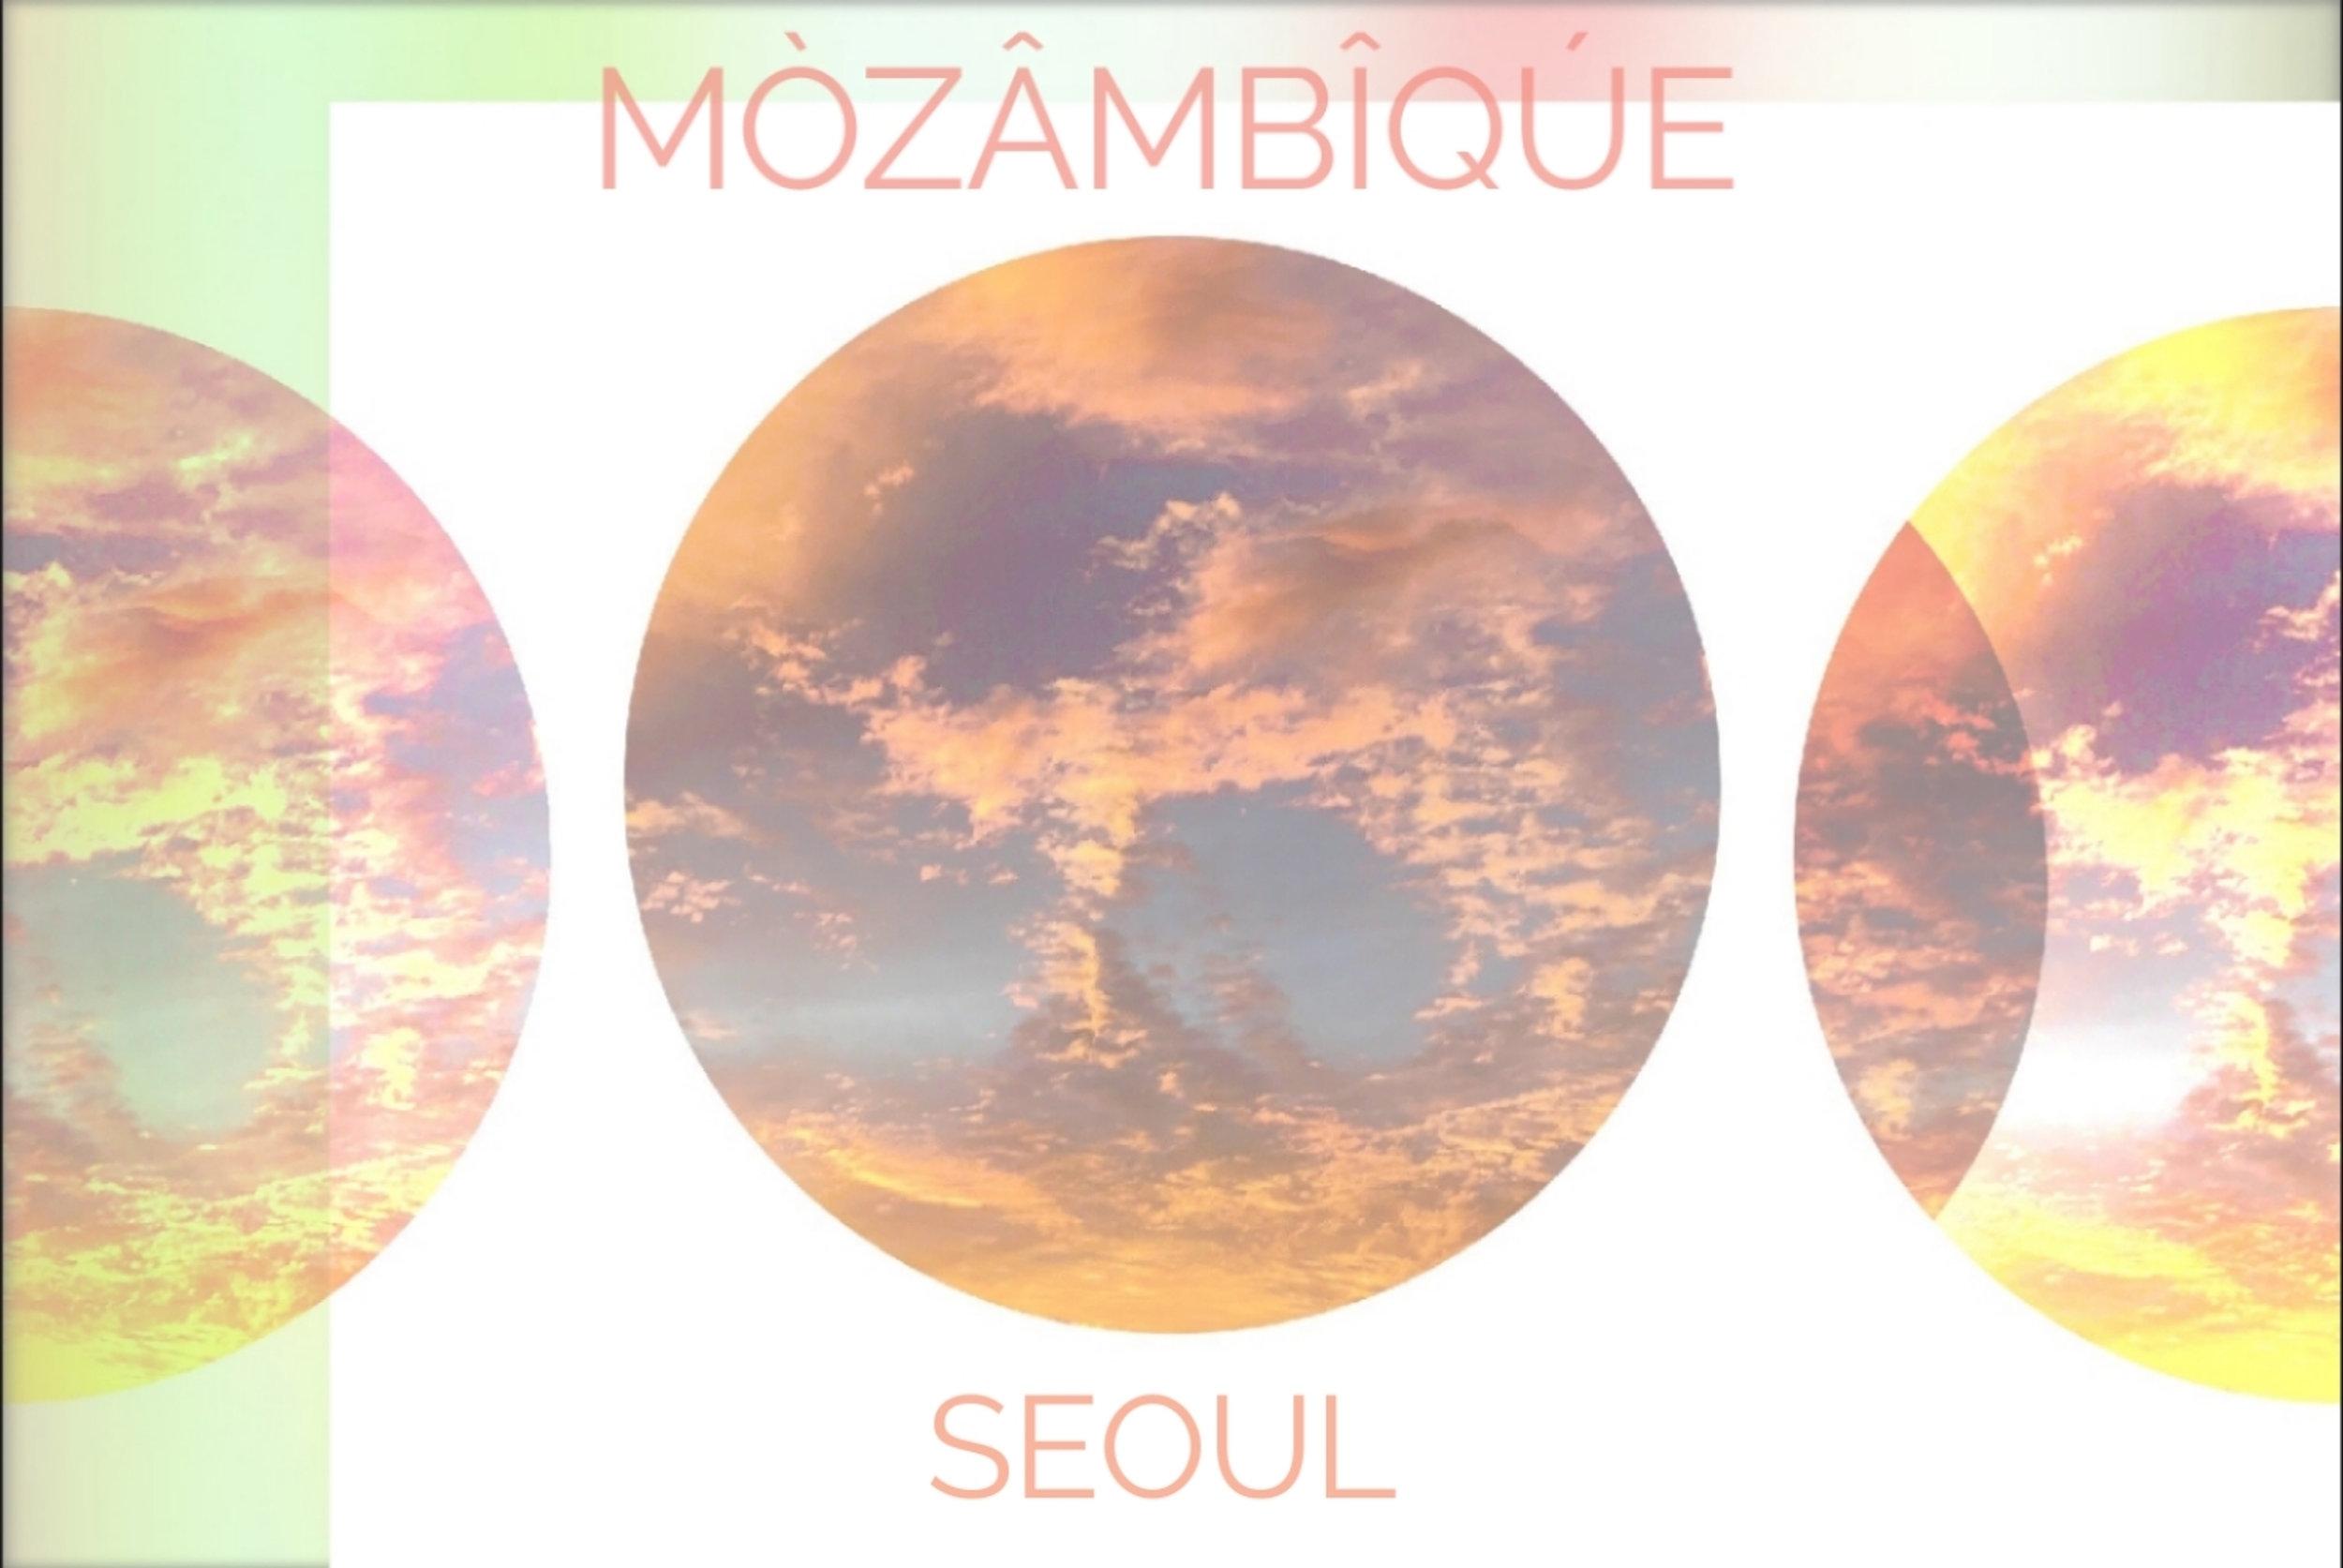 Mozambique.Seoul.jpg